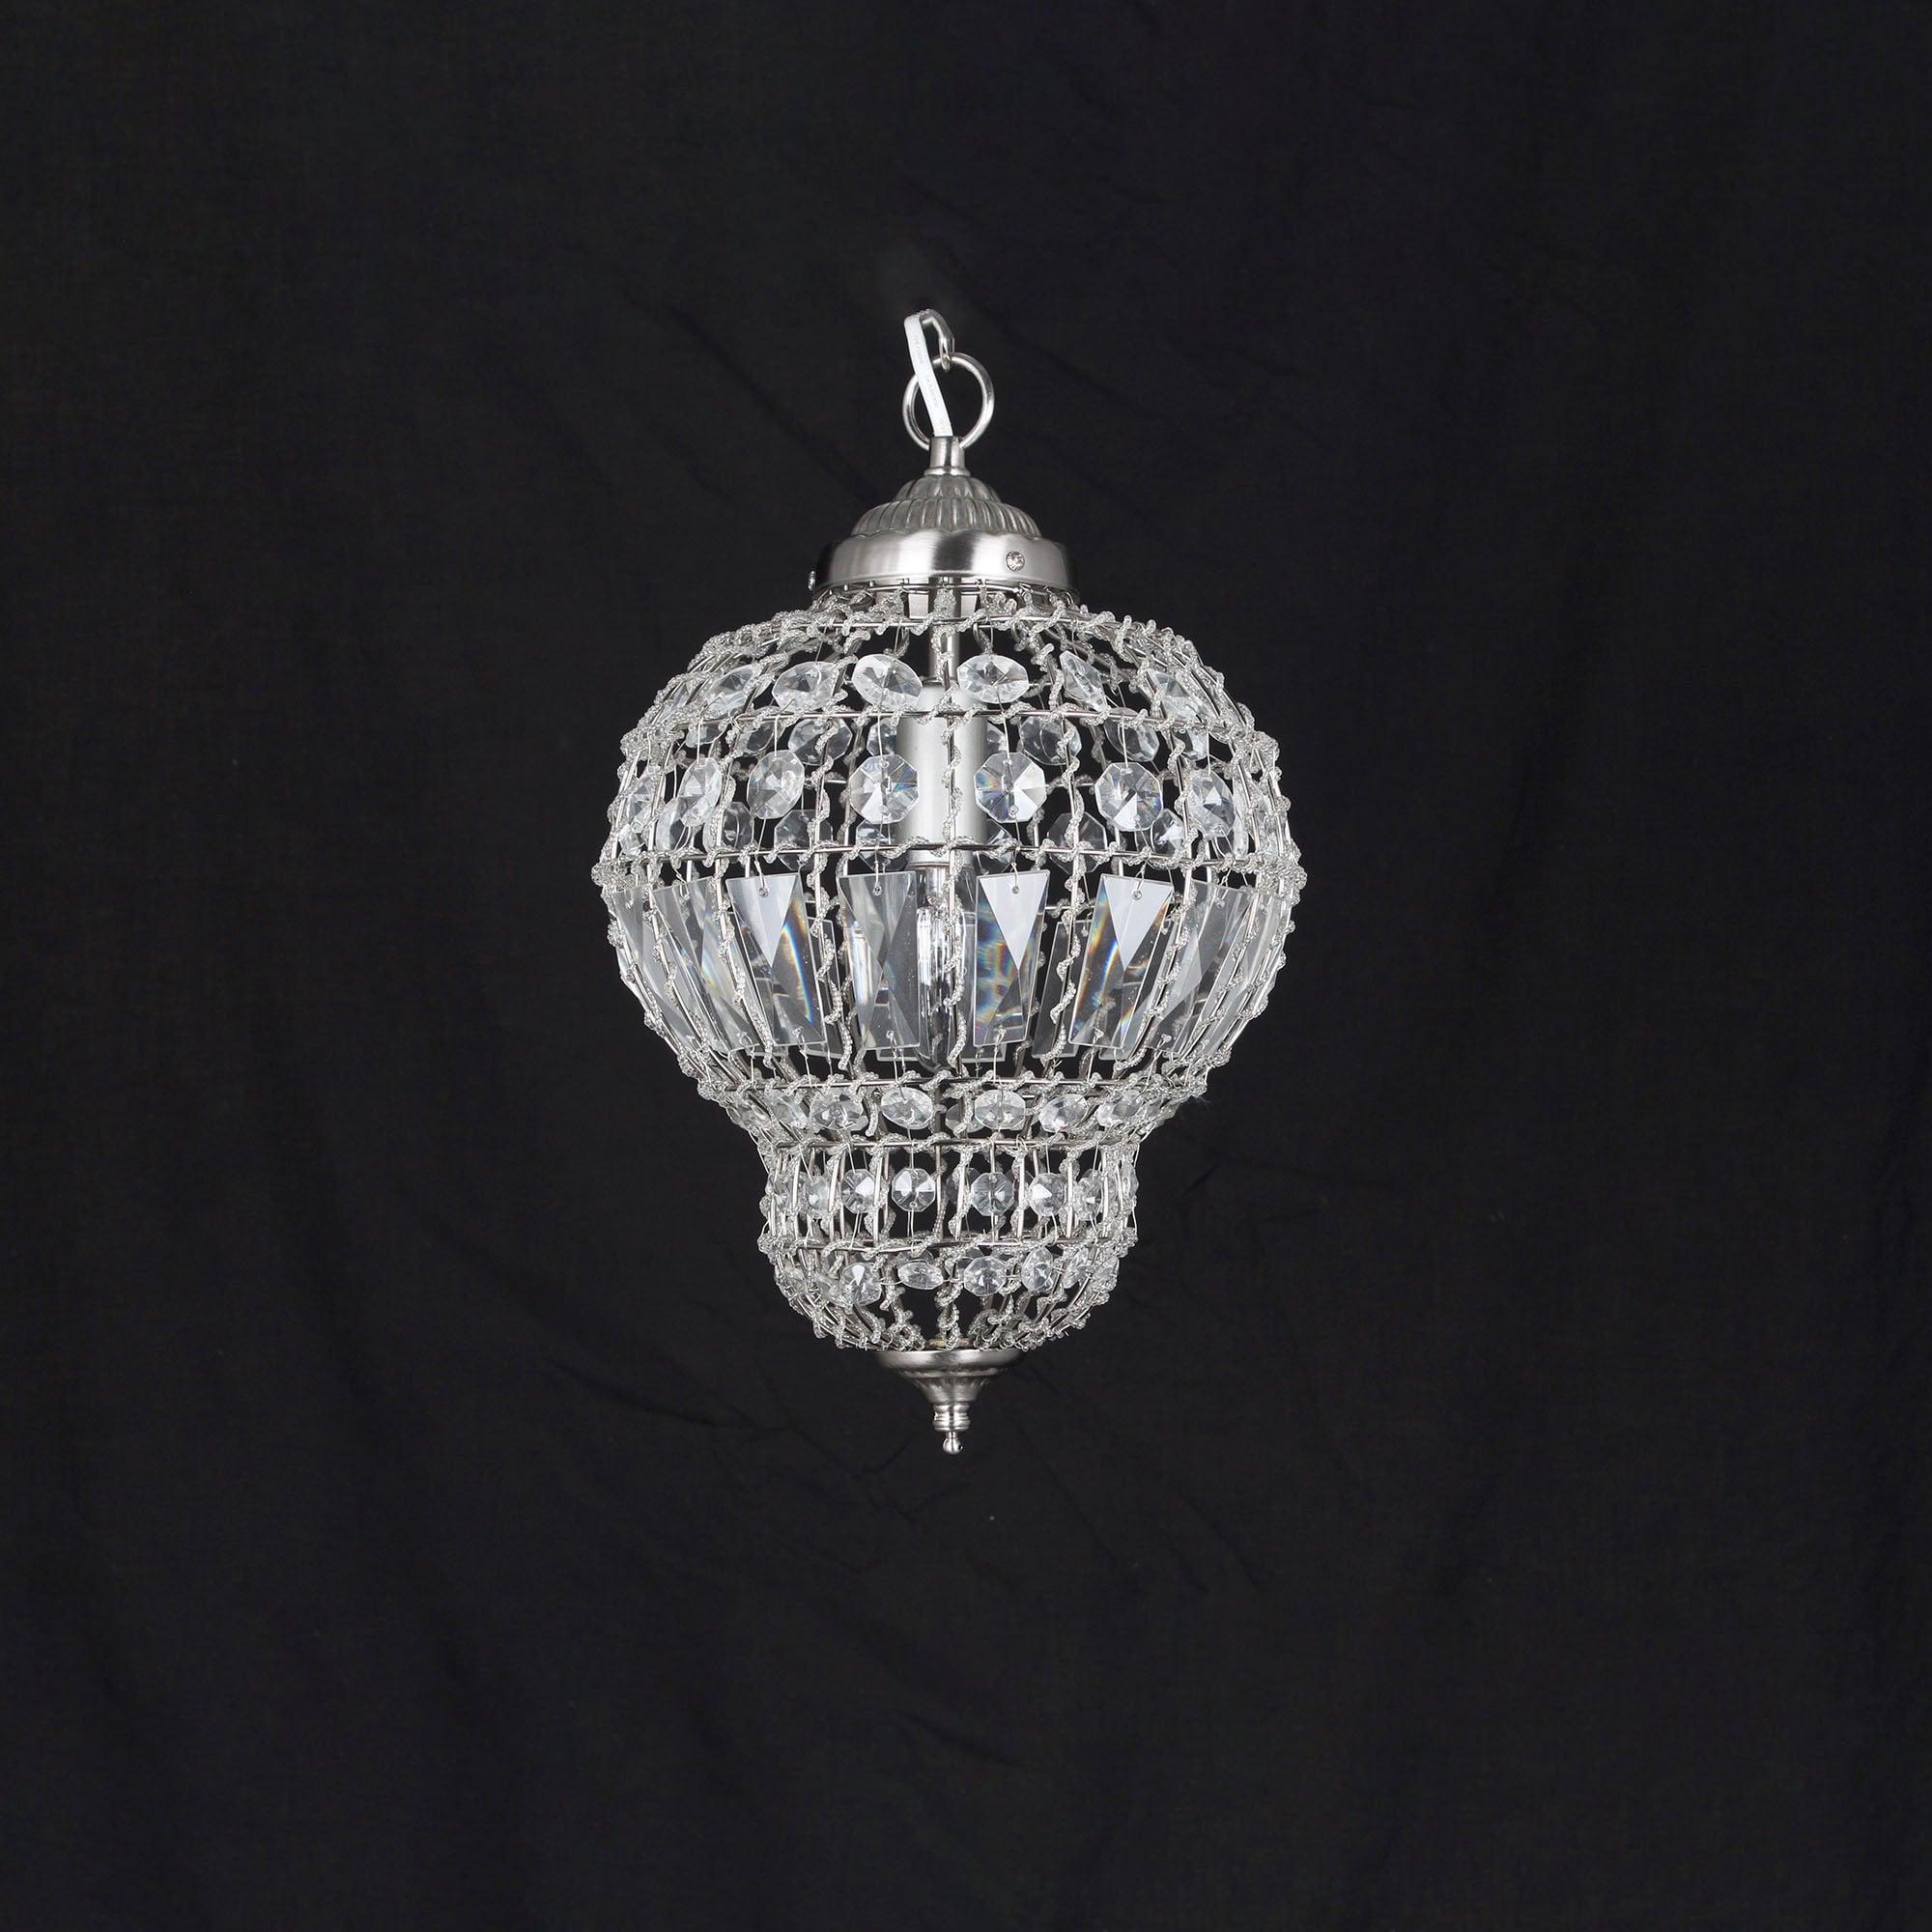 Crystal pendant lighting 3 ring led modern crystal chandelier crystal pendant lighting impex lighting morocco satin nickel 1lt indoor pendant light co812161 arubaitofo Gallery